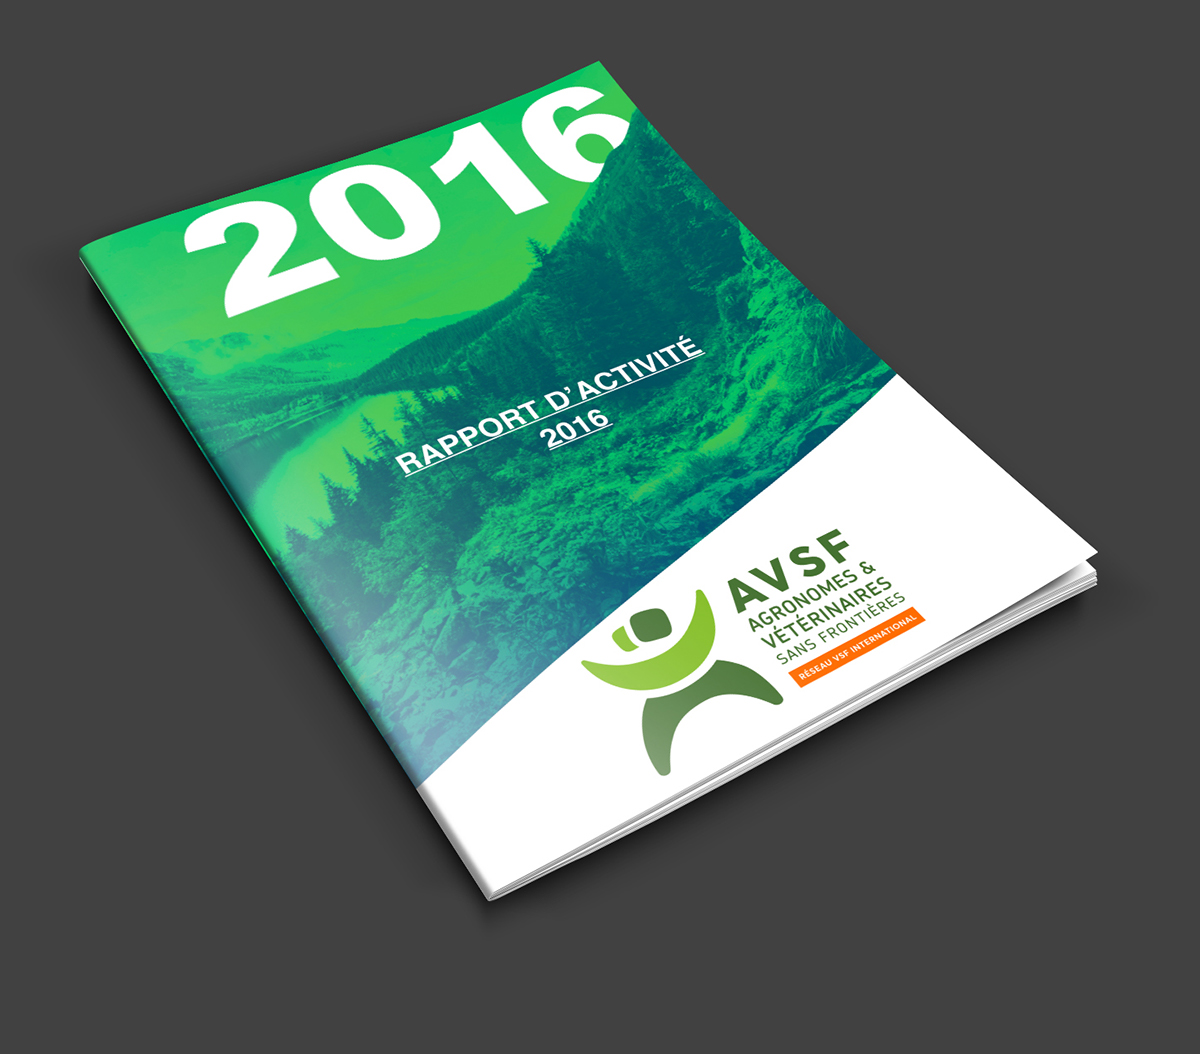 Rapport D Activité Avsf Annual Report Avsf On Behance